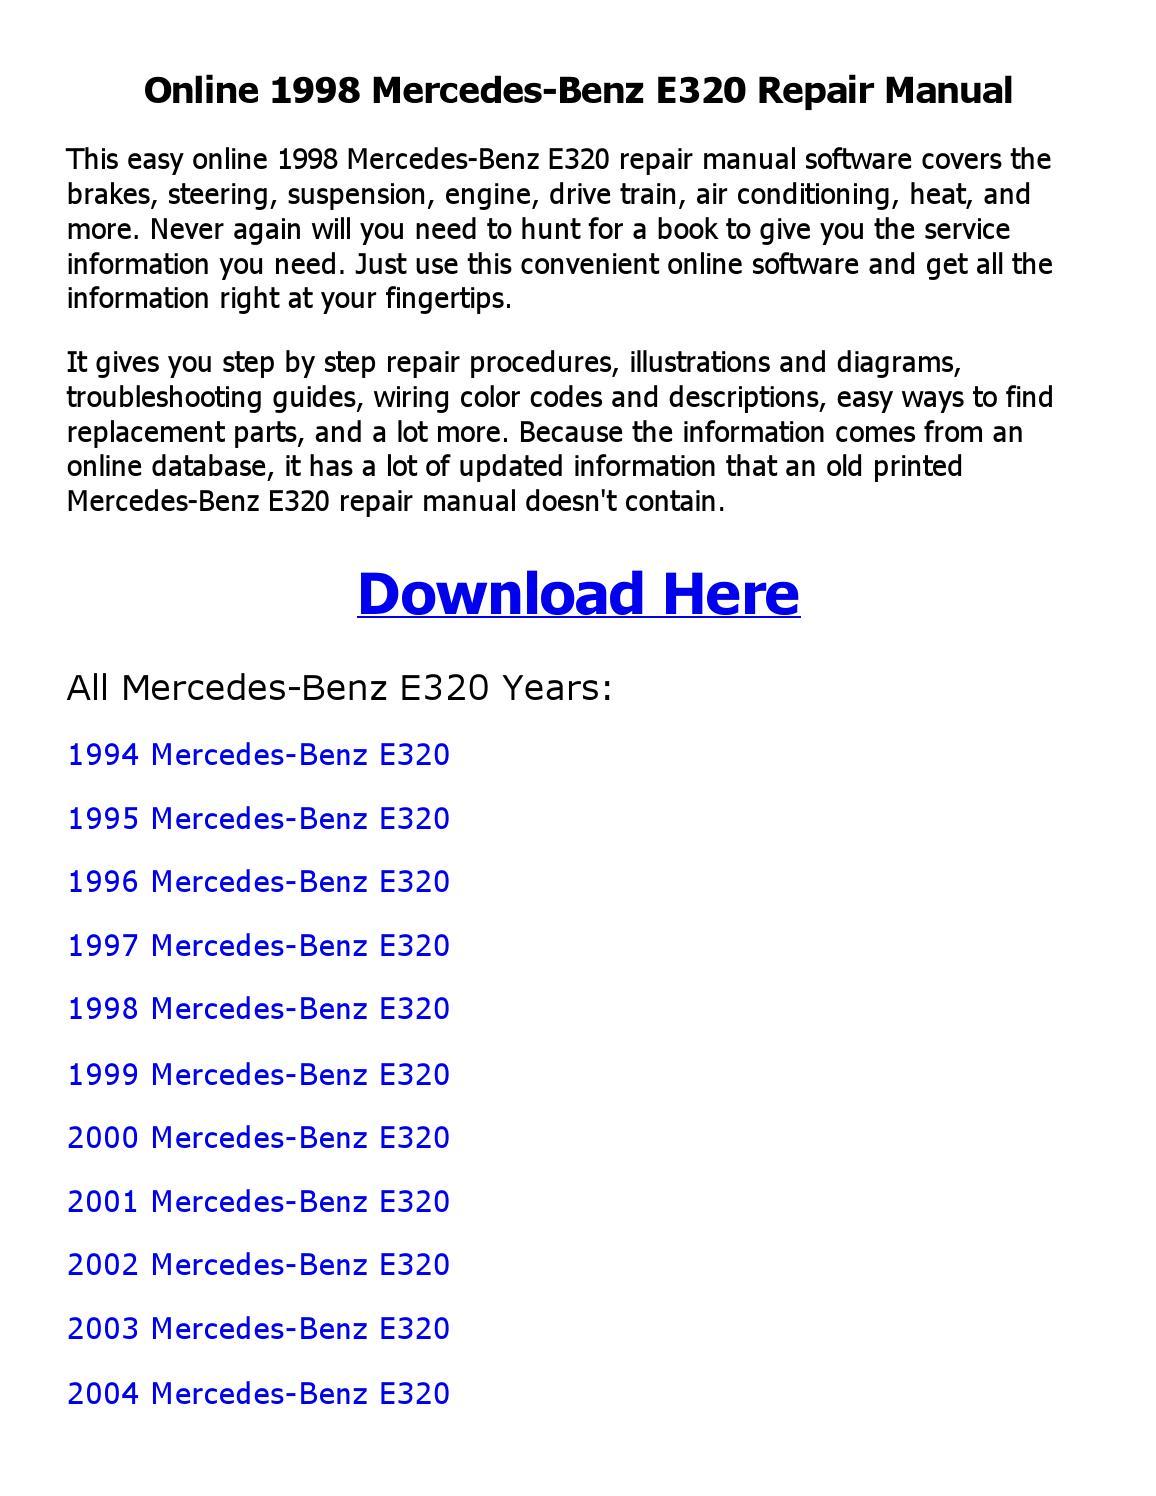 1998 mercedes benz e320 repair manual online by mhraihan - issuu